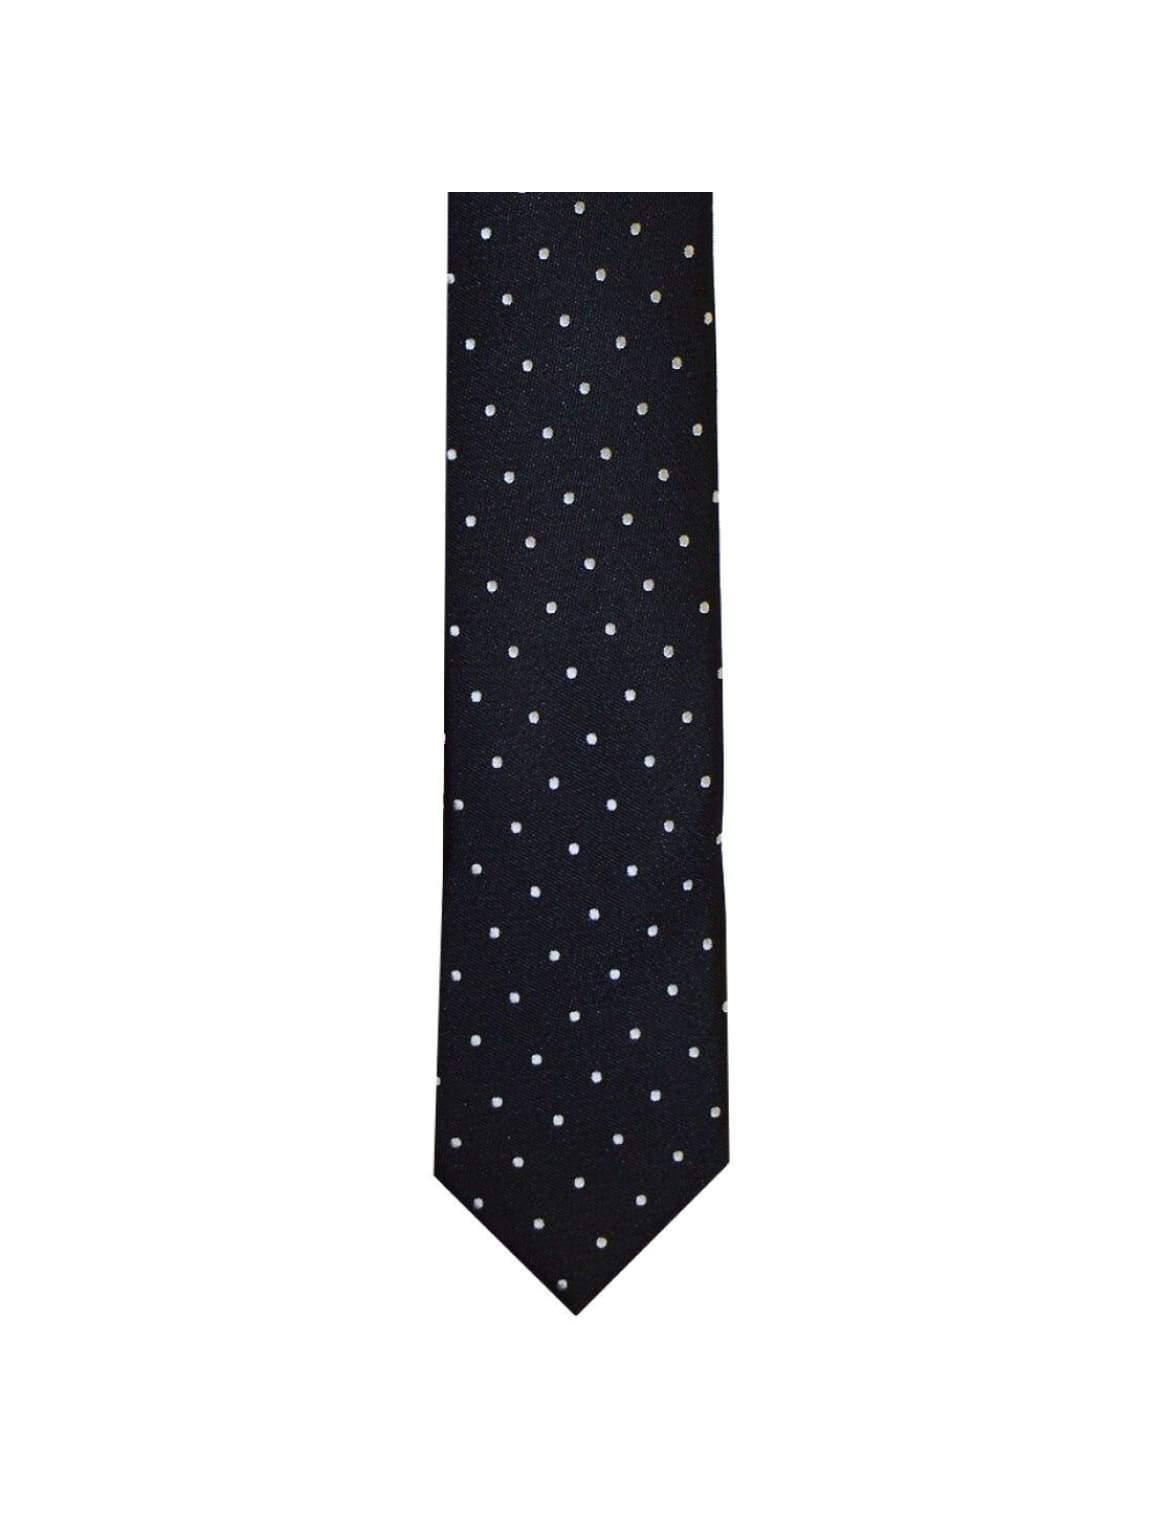 LA Smith Black And White Skinny Polka Dot Tie - Accessories